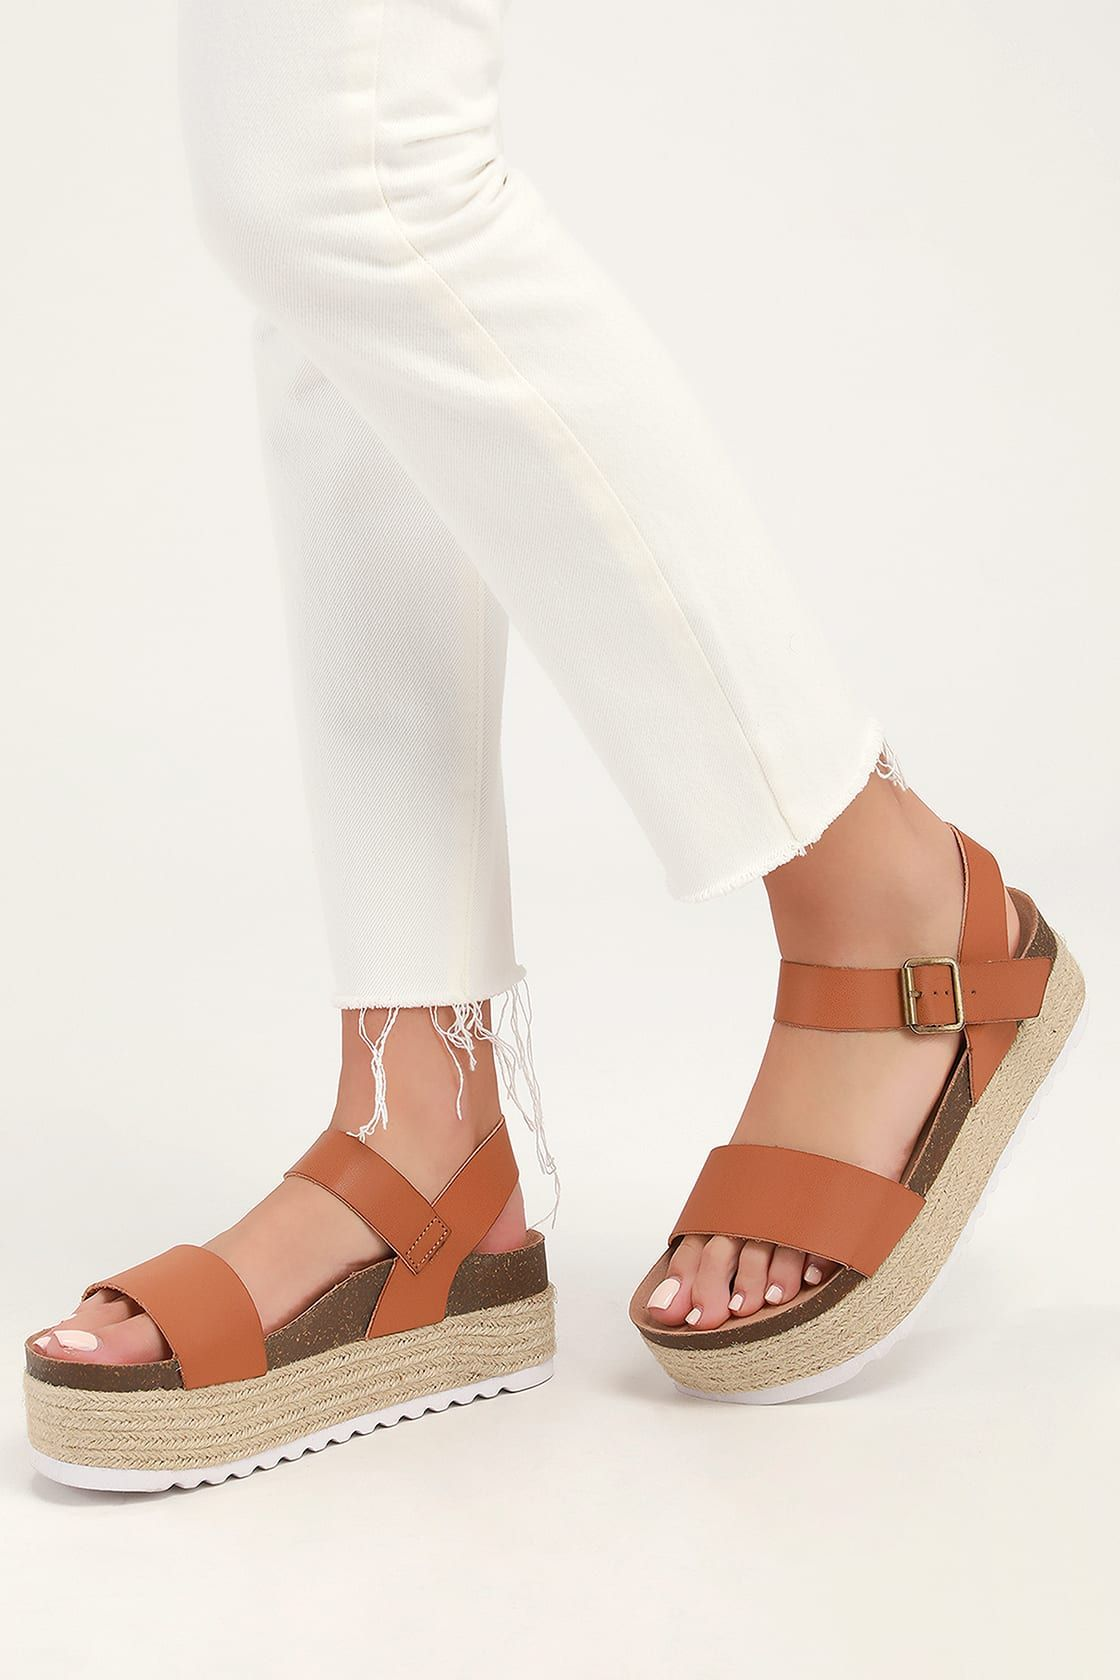 26ea0a46b13 Palms Smooth Saddle Brown Espadrille Flatform Sandals in 2019 ...